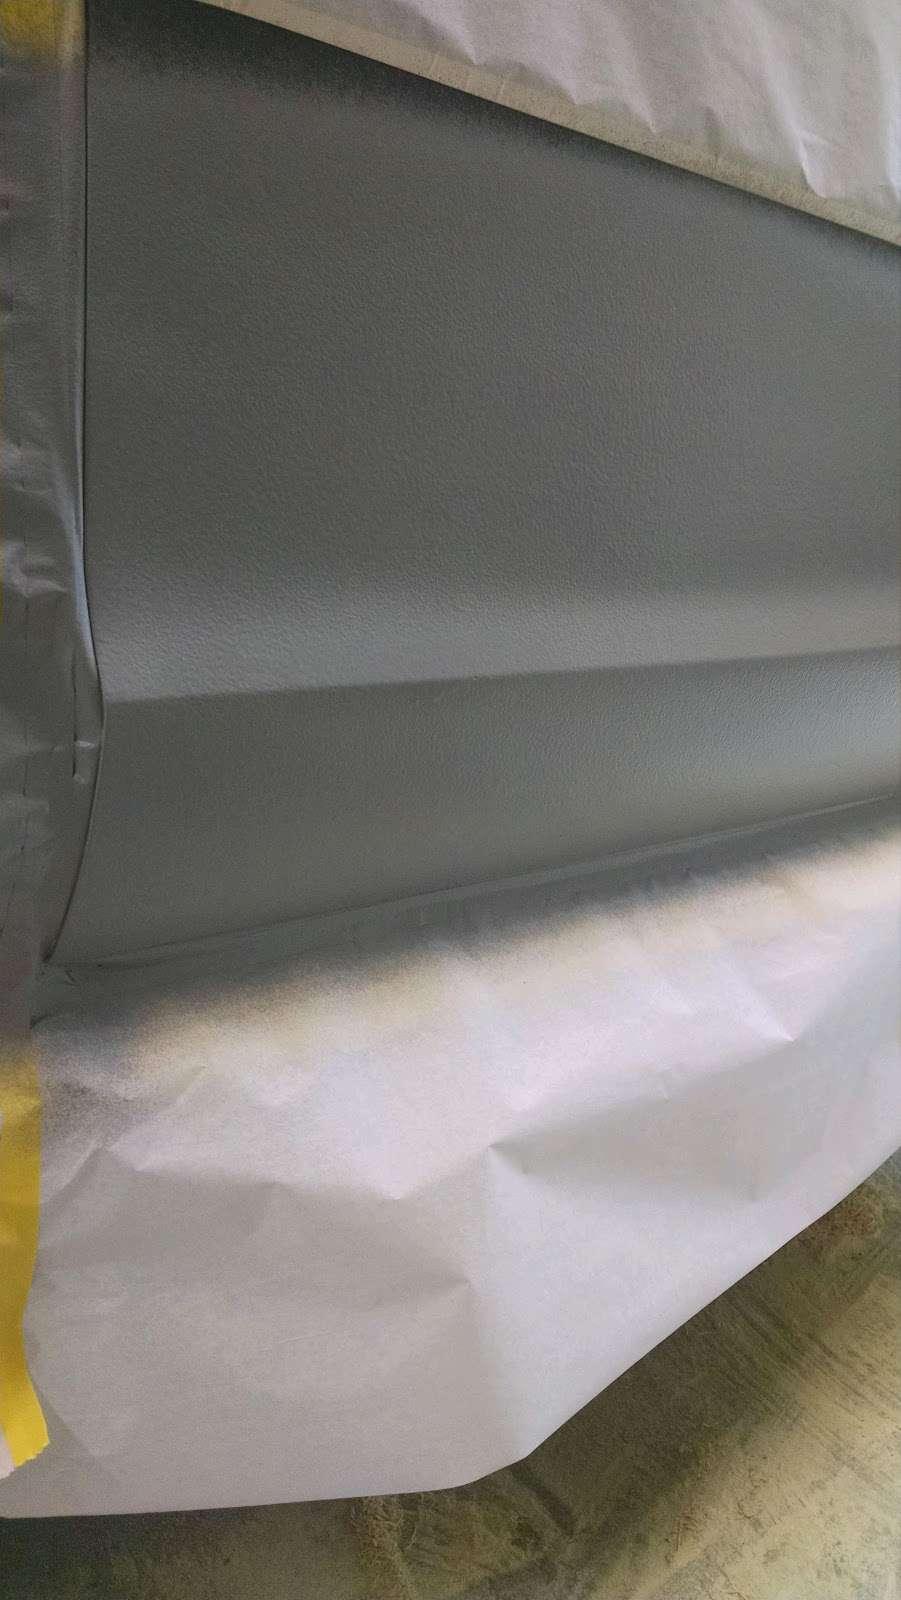 Harkins Auto Body - car repair  | Photo 8 of 10 | Address: 580 Kelley Blvd, North Attleborough, MA 02760, USA | Phone: (508) 216-6184